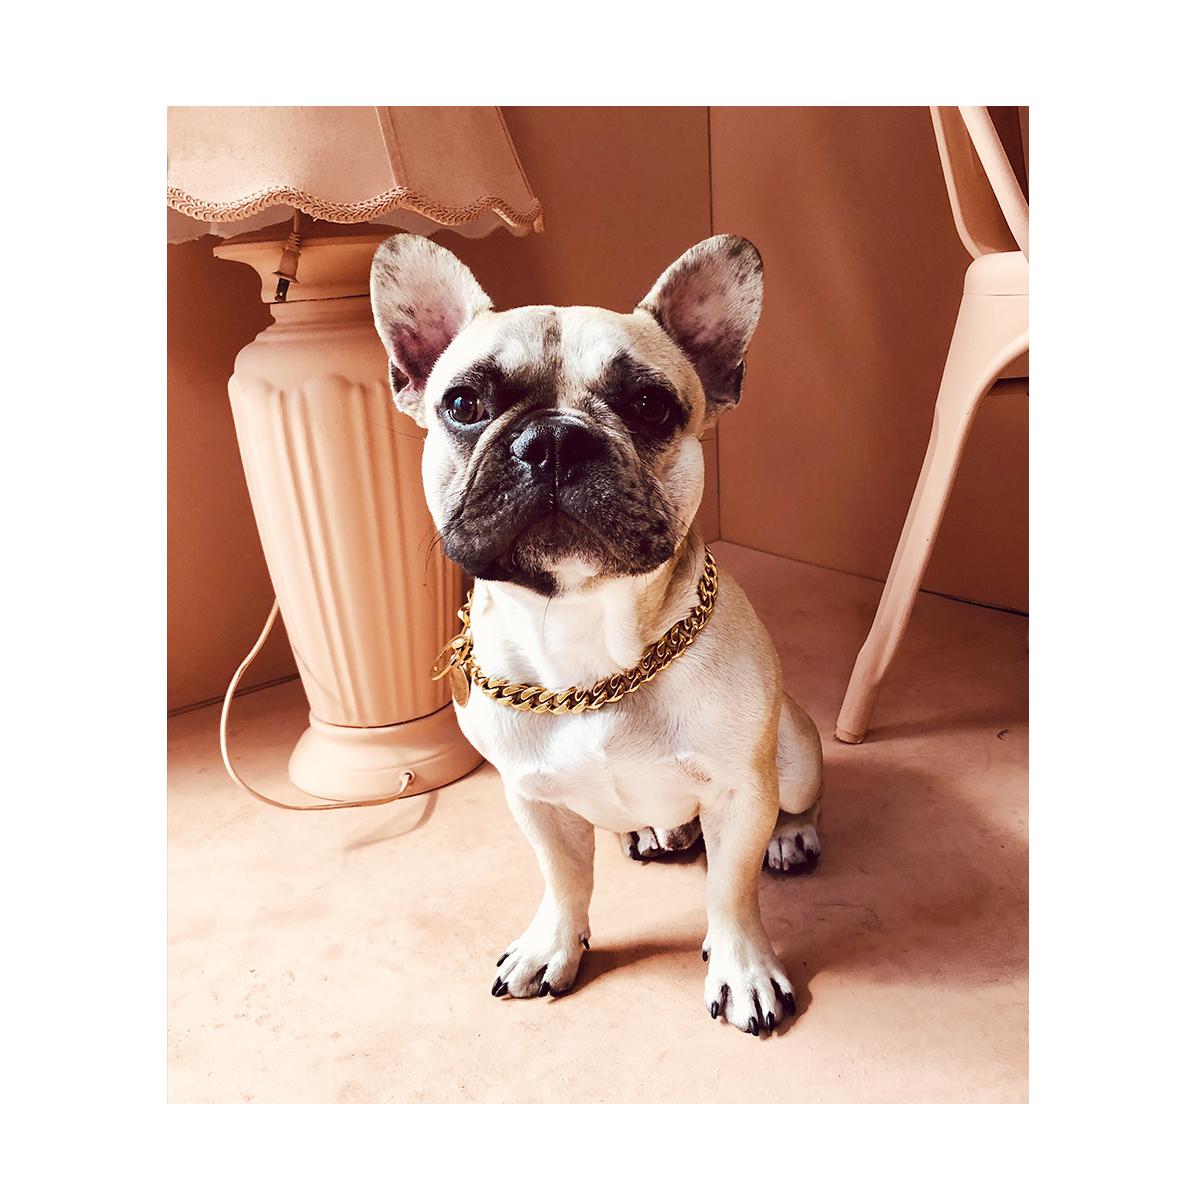 Dog-portrait-photography-studio-los-angeles.jpg